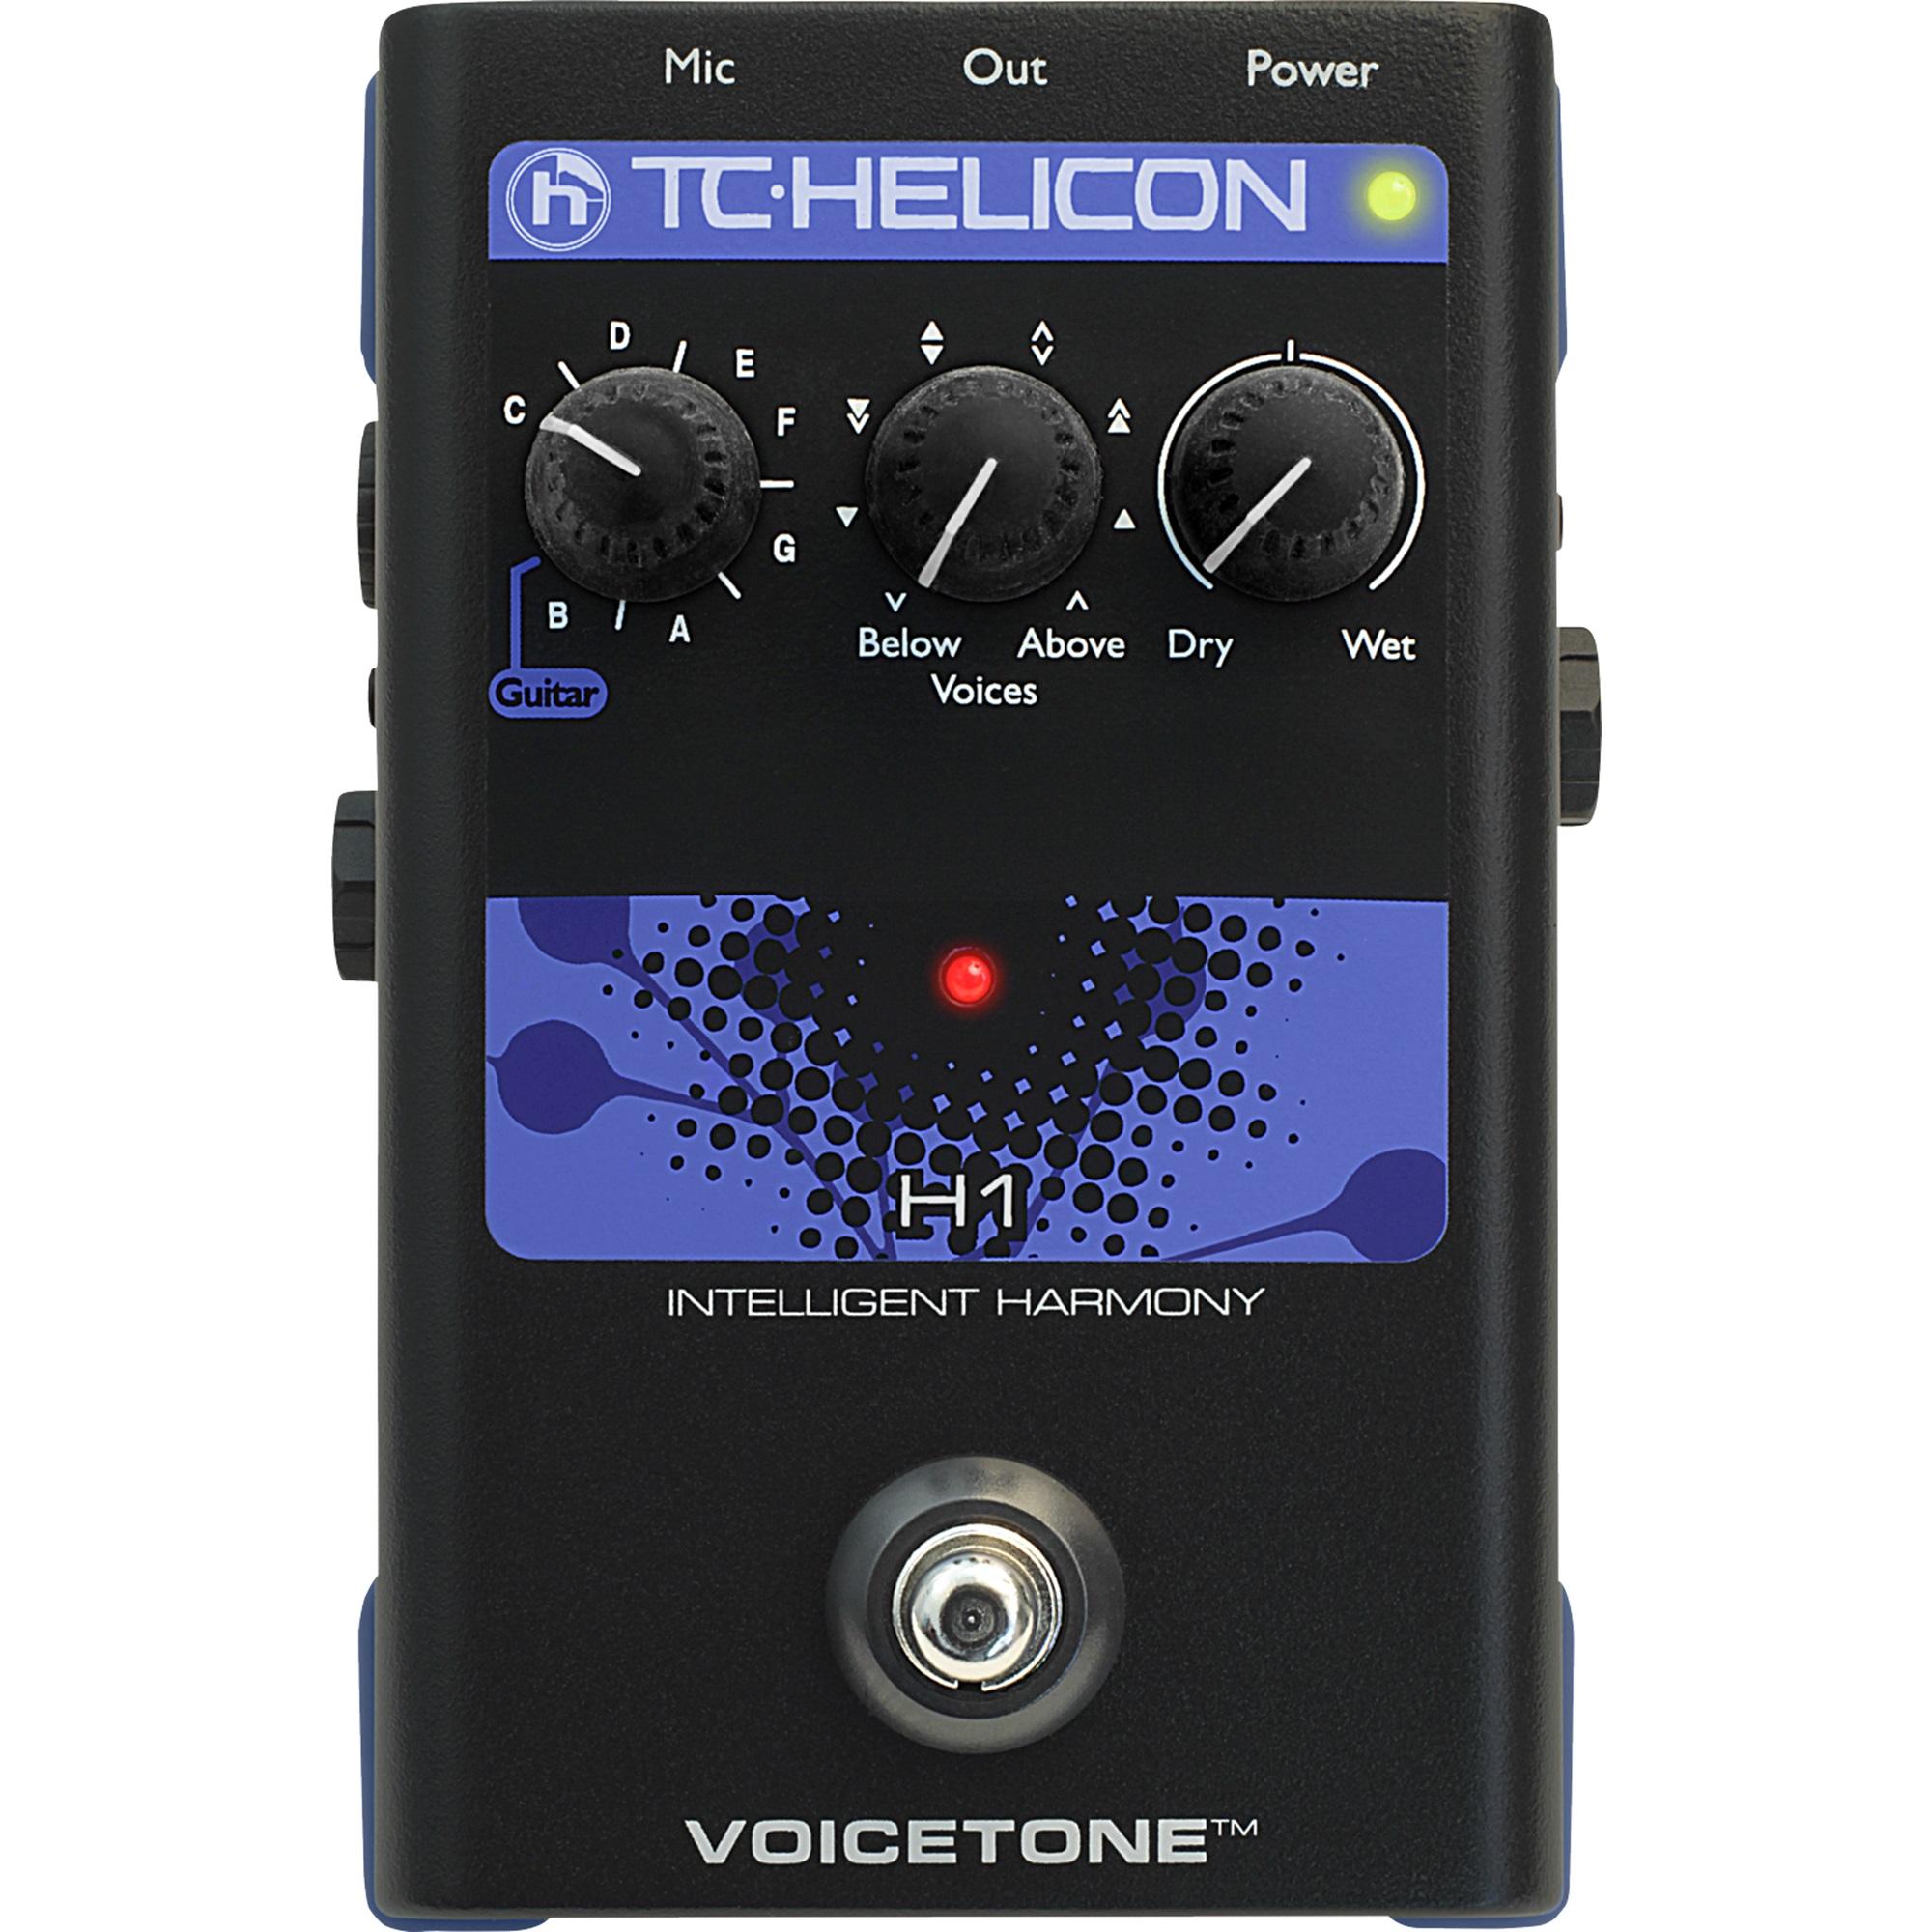 TC Helicon VoceTone H1